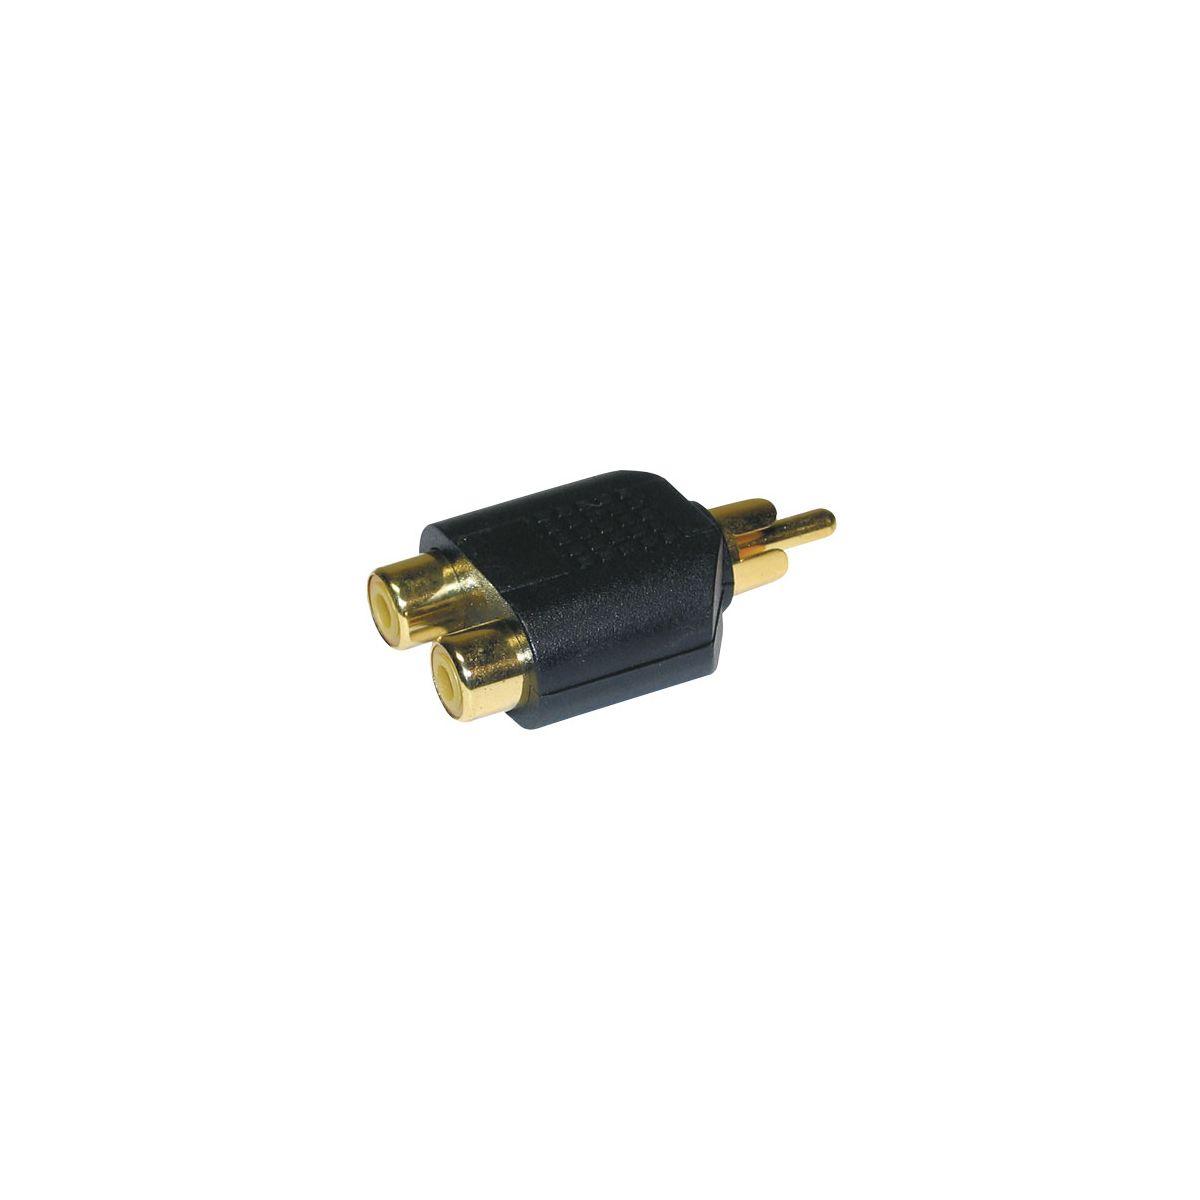 Adaptateurs - Energyson - Adaptateur 2 RCA femelle...